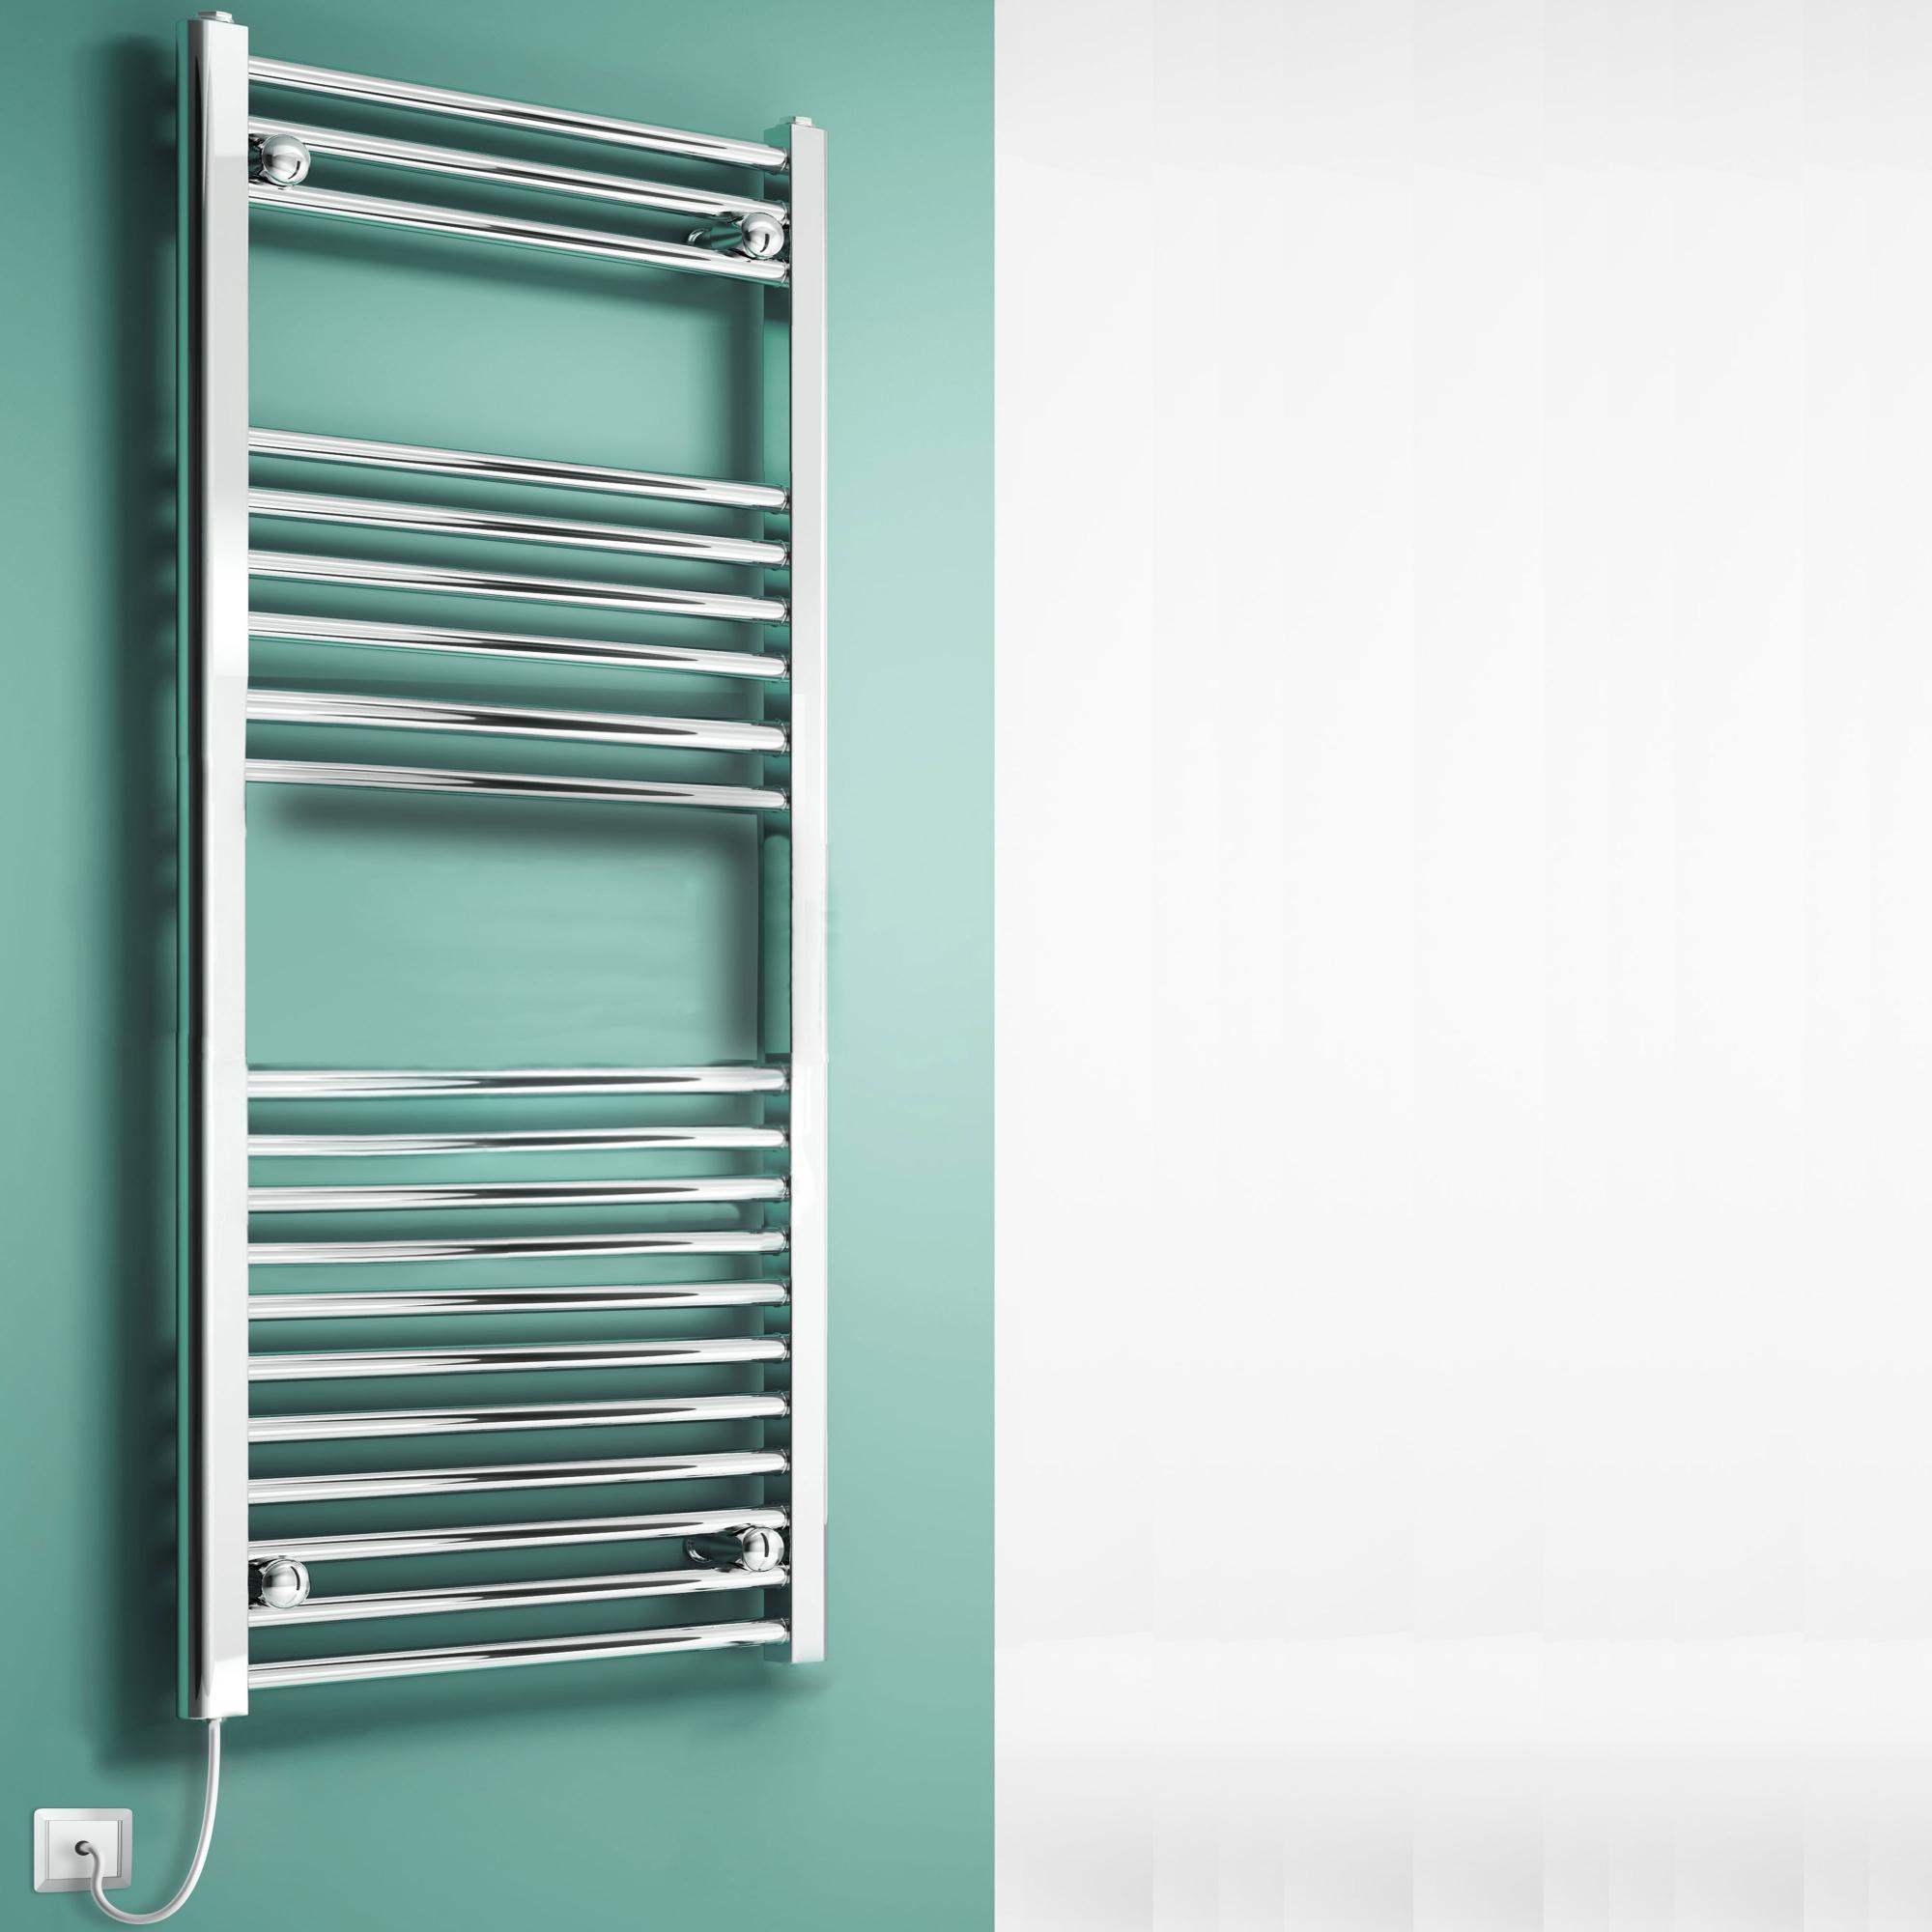 Reina Eross Dry Electric Heated Towel Rail 1100mm H x 300mm W